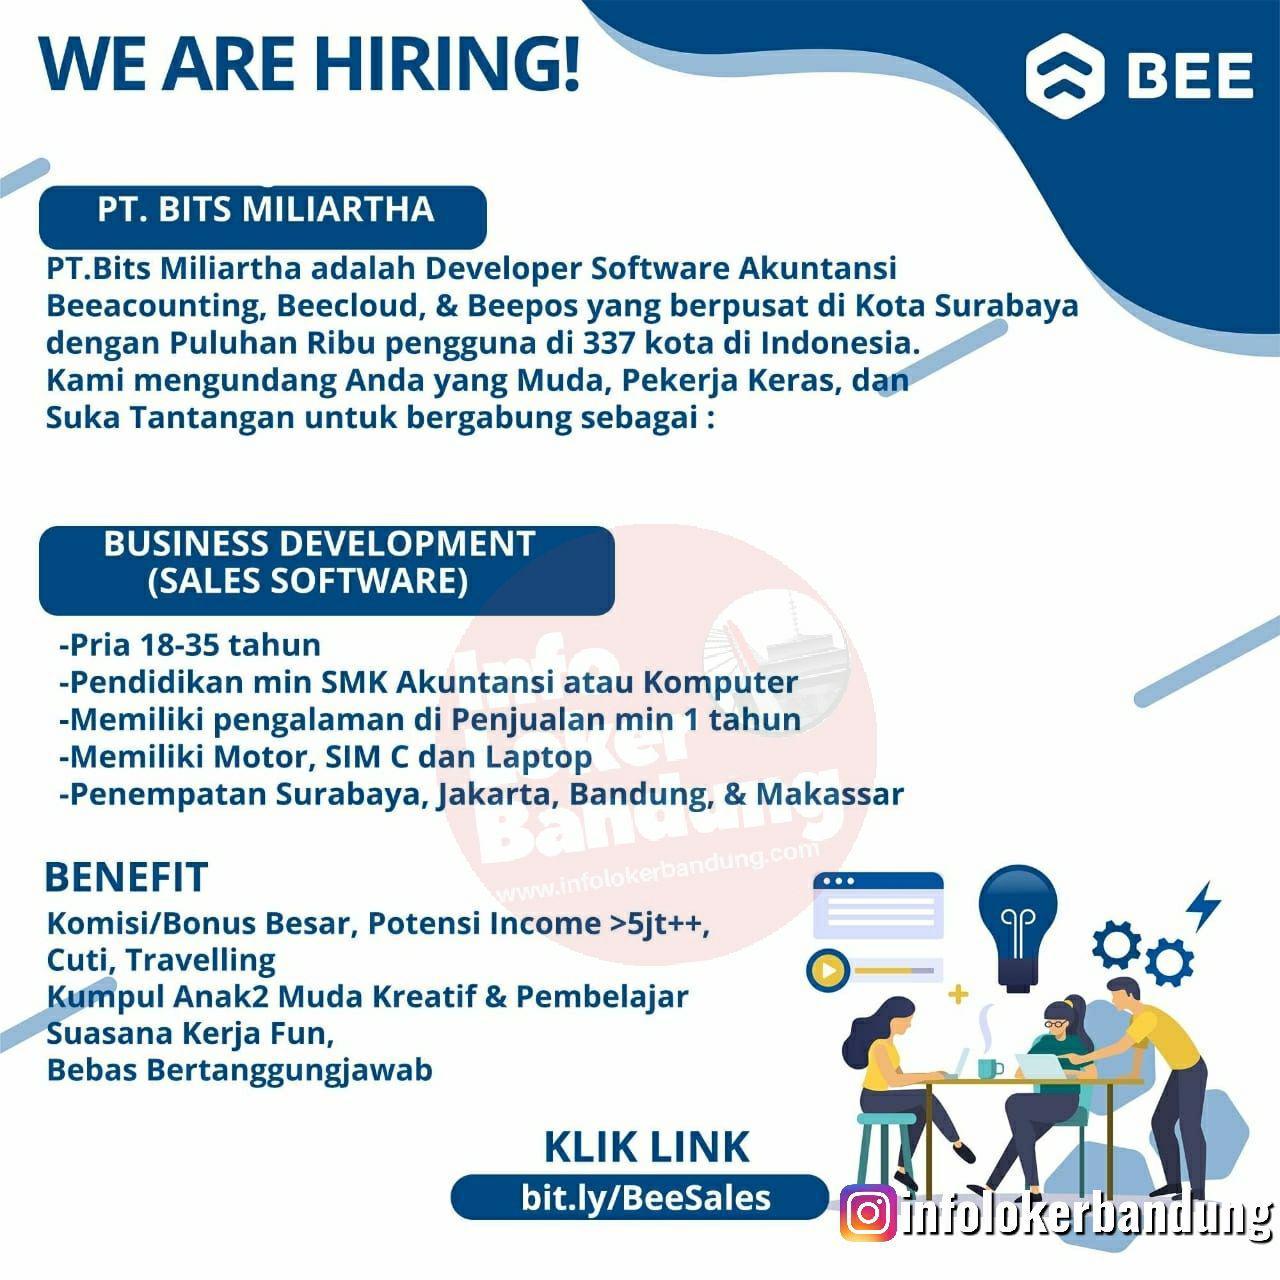 Lowongan Kerja Business Development PT. Bits Miliartha Bandung Oktober 2019